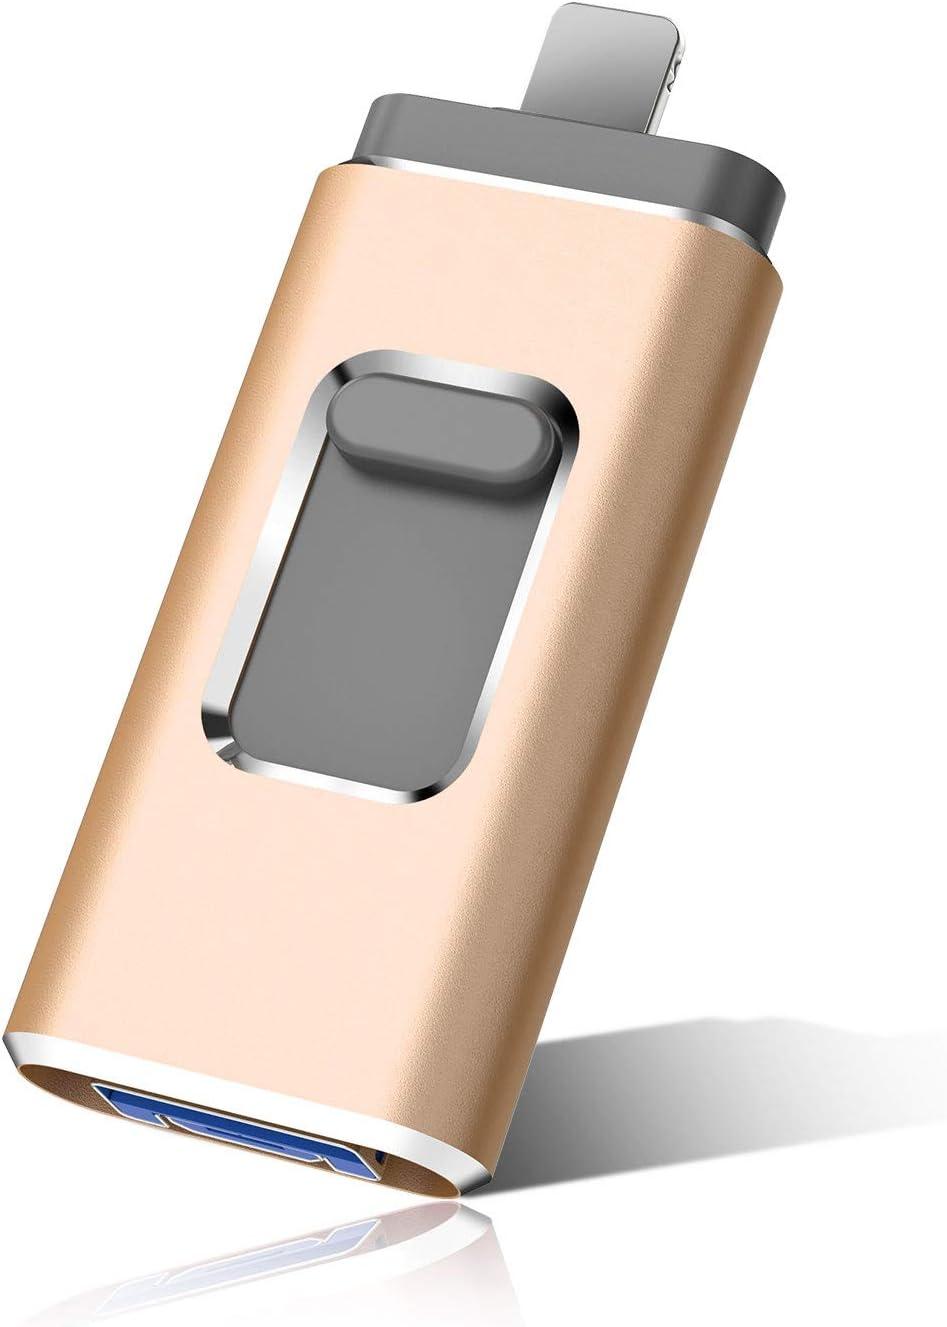 Flash Drive for Phone Photo Stick 1TB Memory Stick USB 3.0 Flash Drive Thumb Drive for Phone and Computers (1TB, Gold)